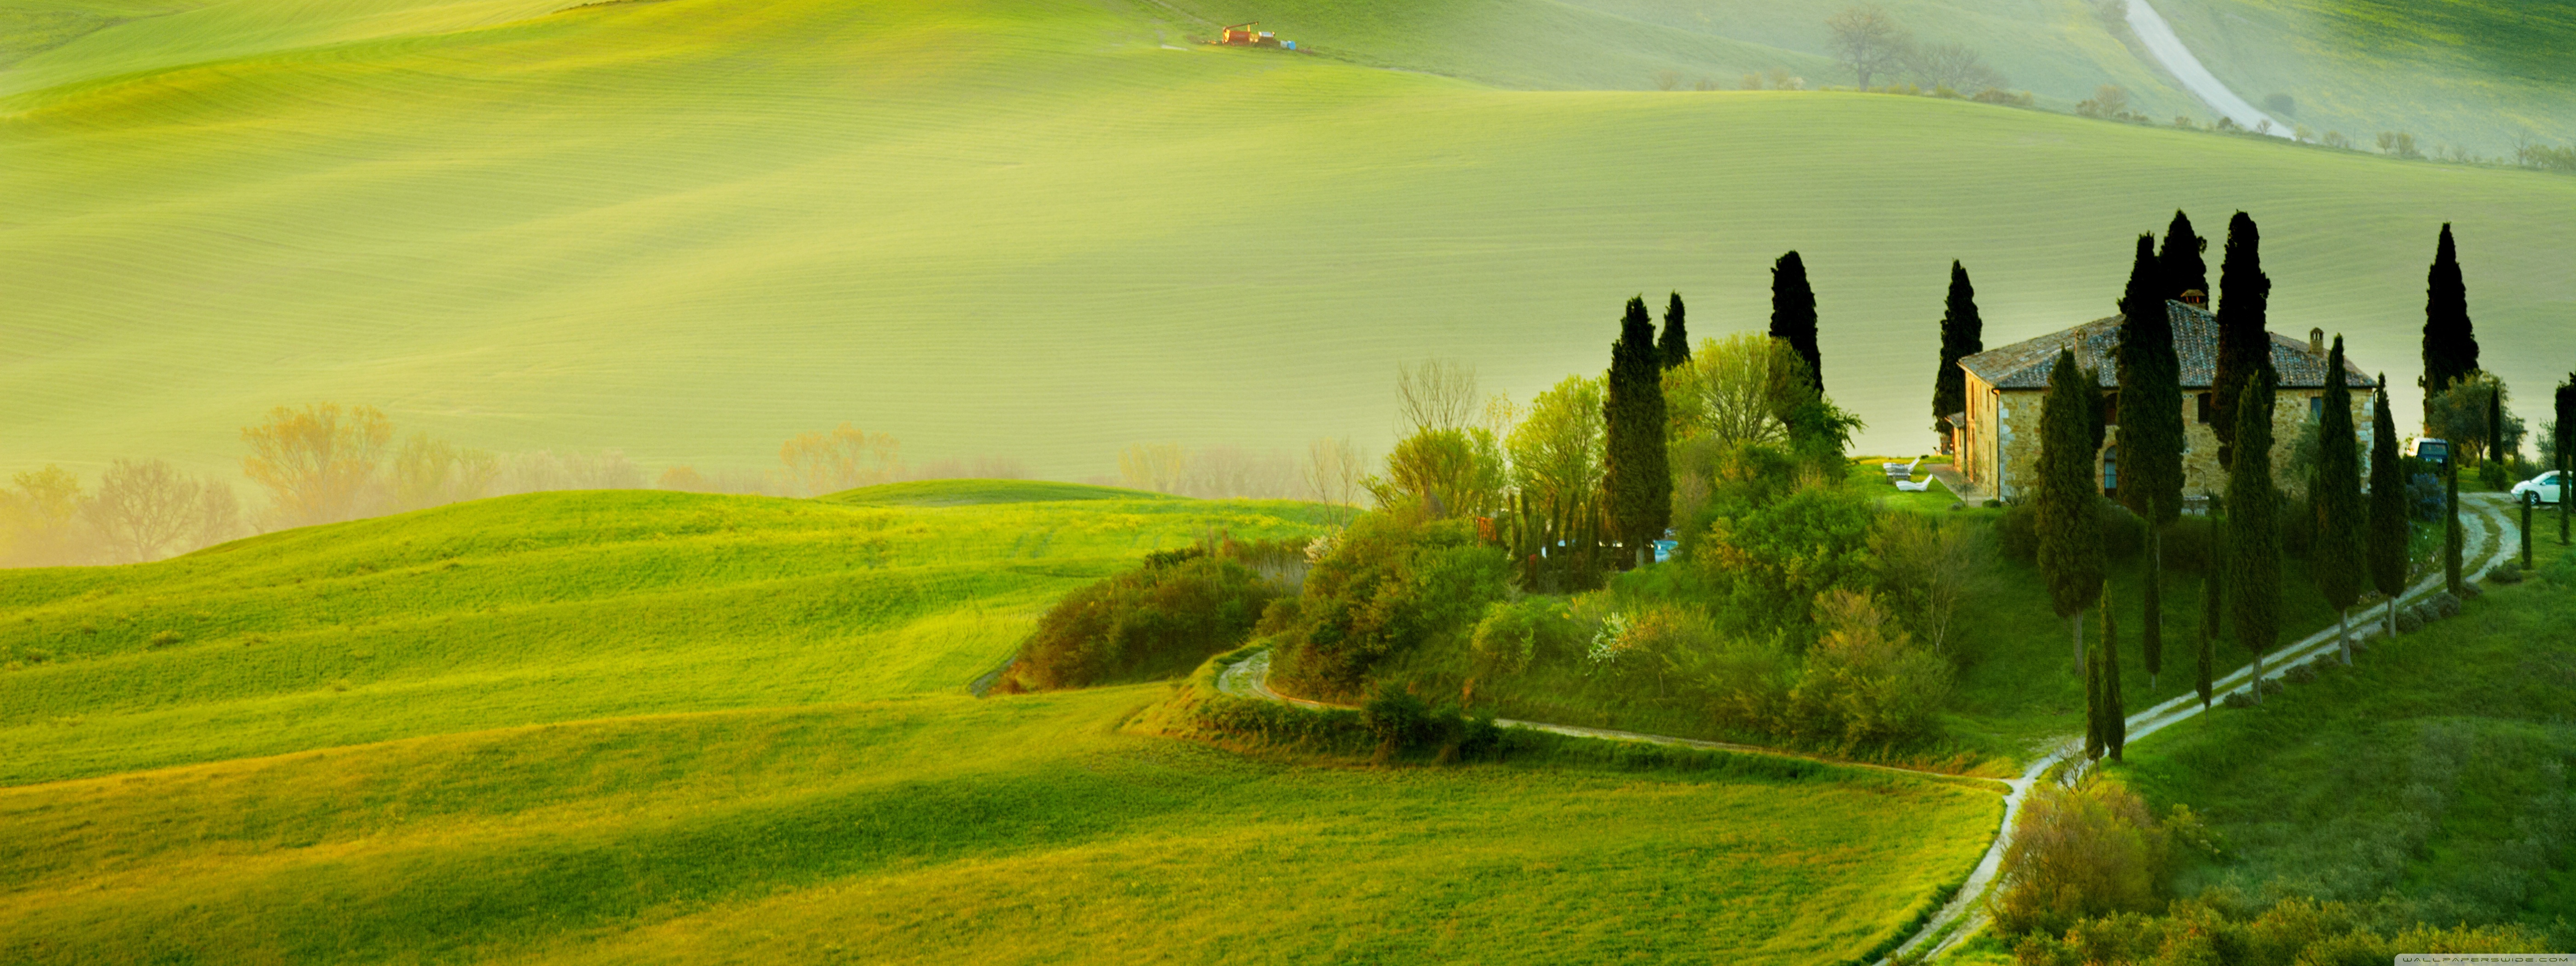 Download Free WallpaperTuscany Spring Landscape